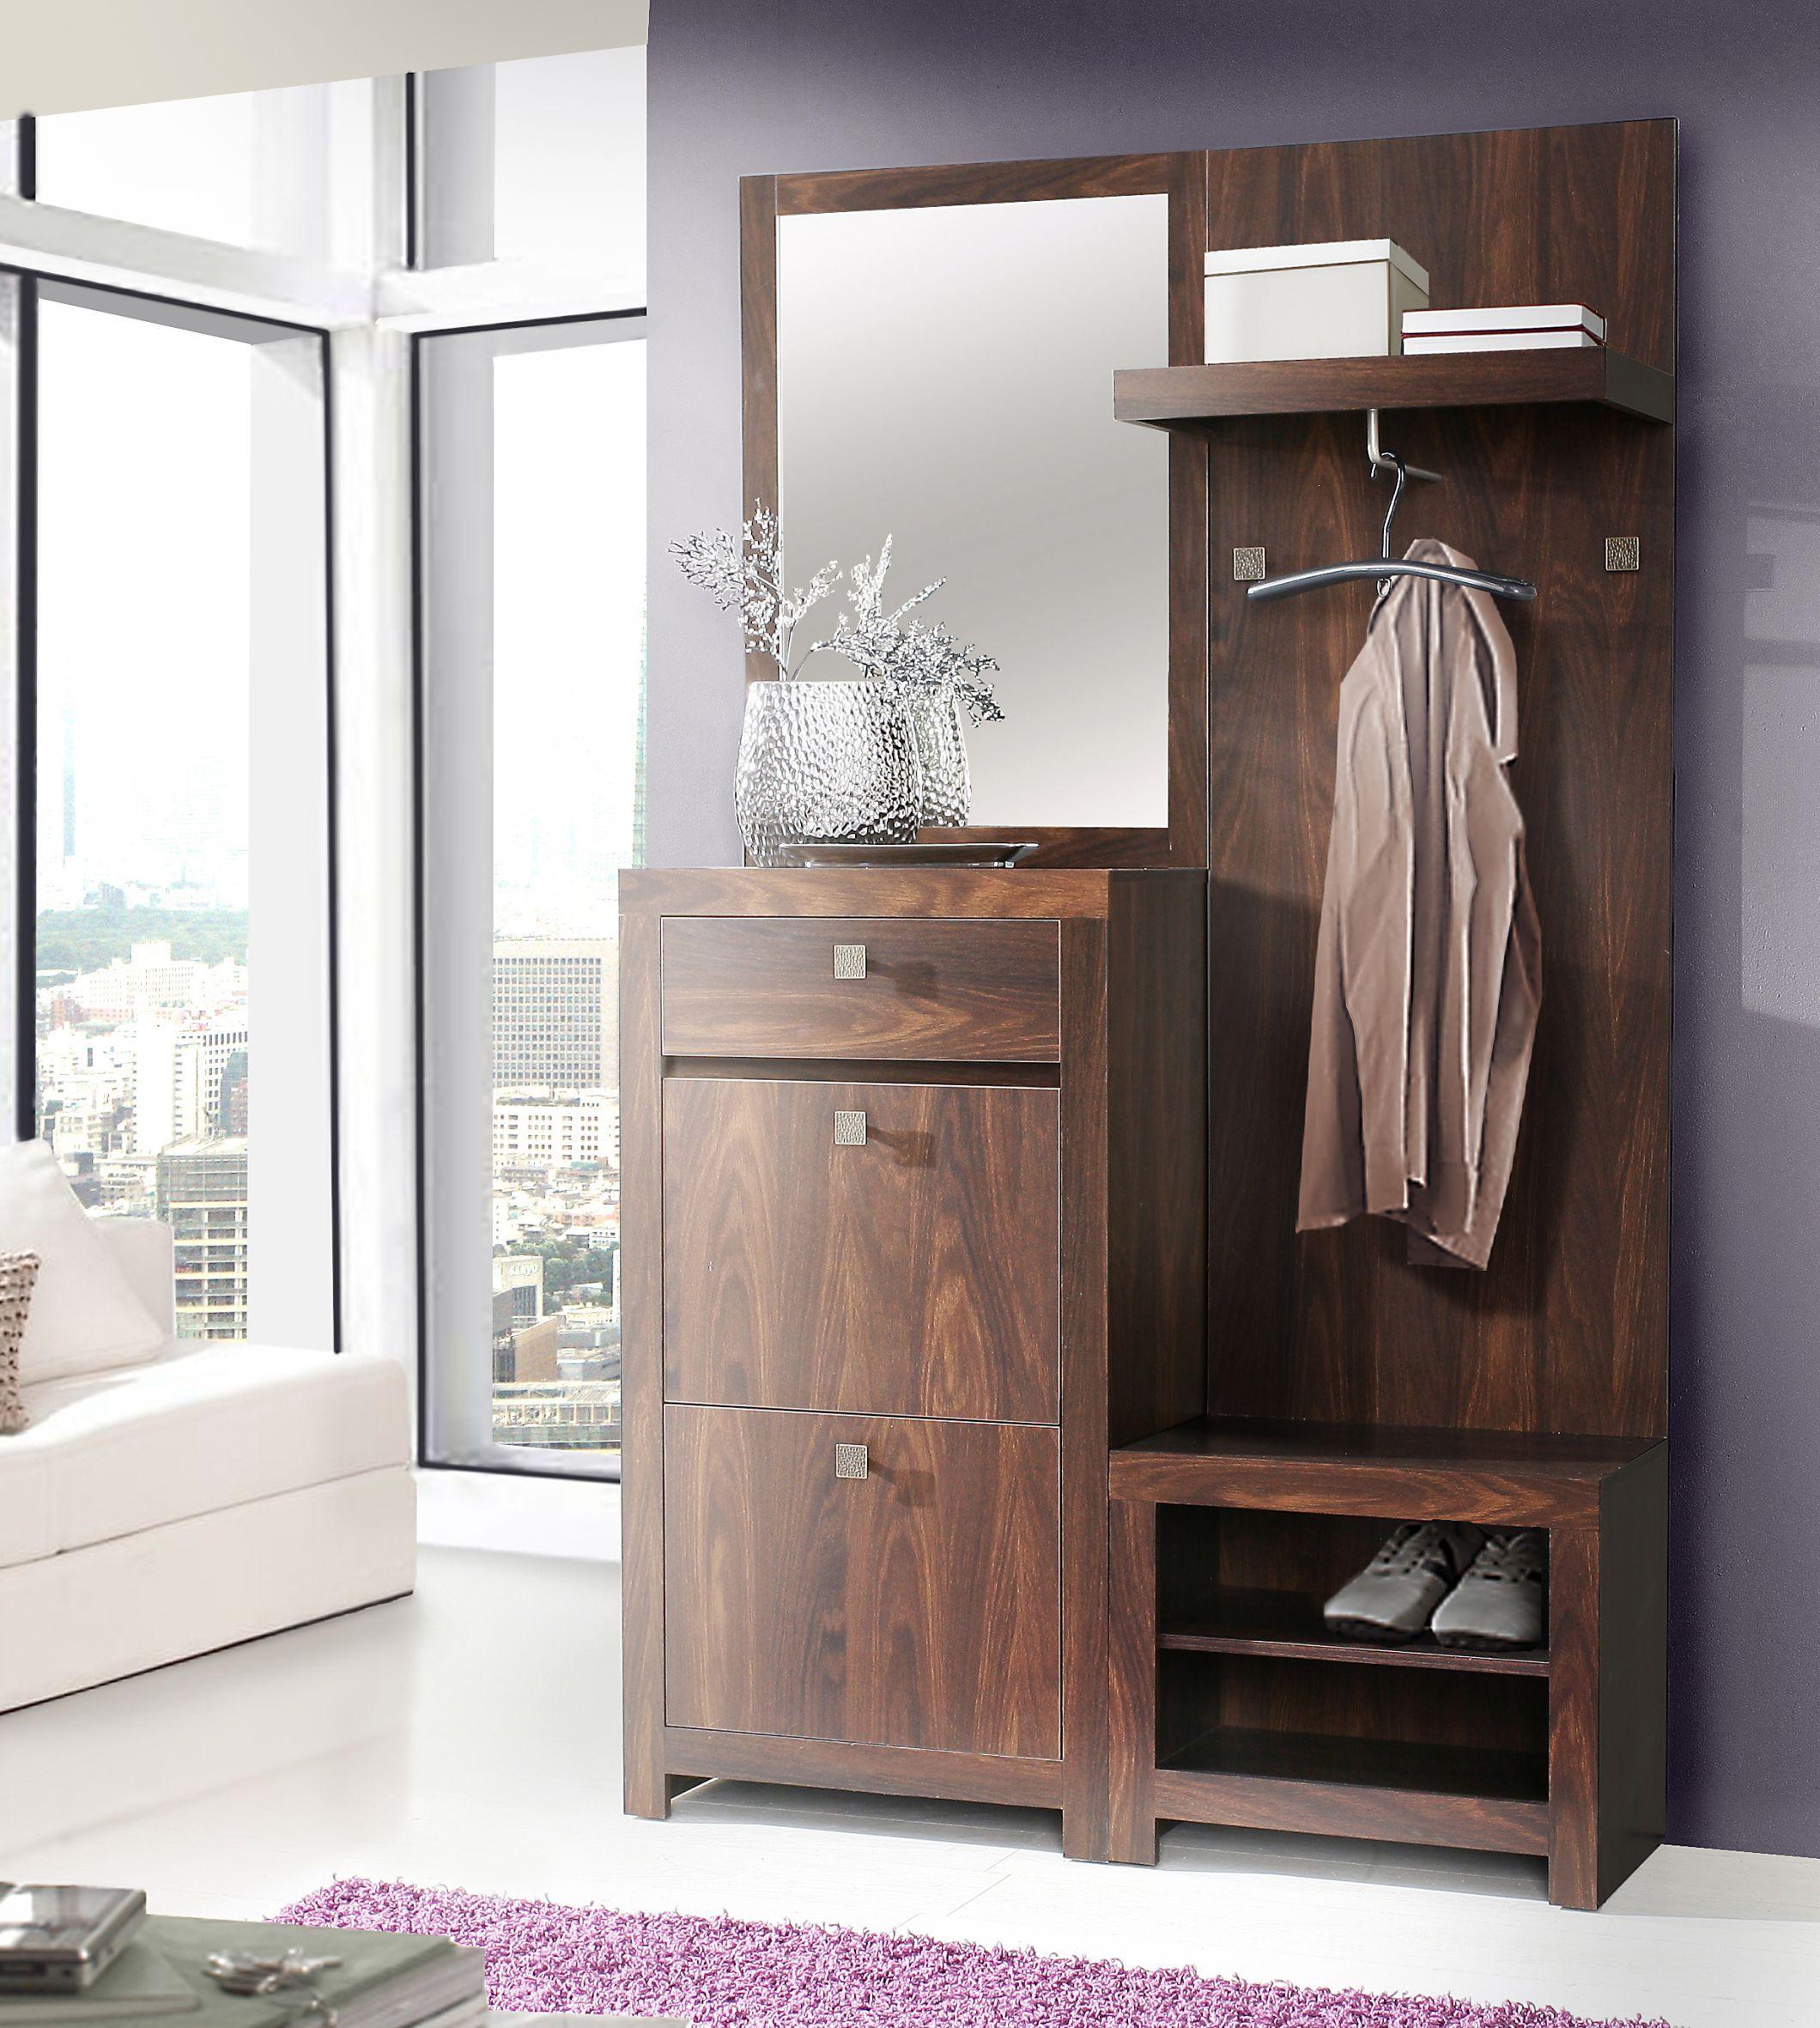 komplett garderobe irma i m bel im kolonialstil gehen. Black Bedroom Furniture Sets. Home Design Ideas